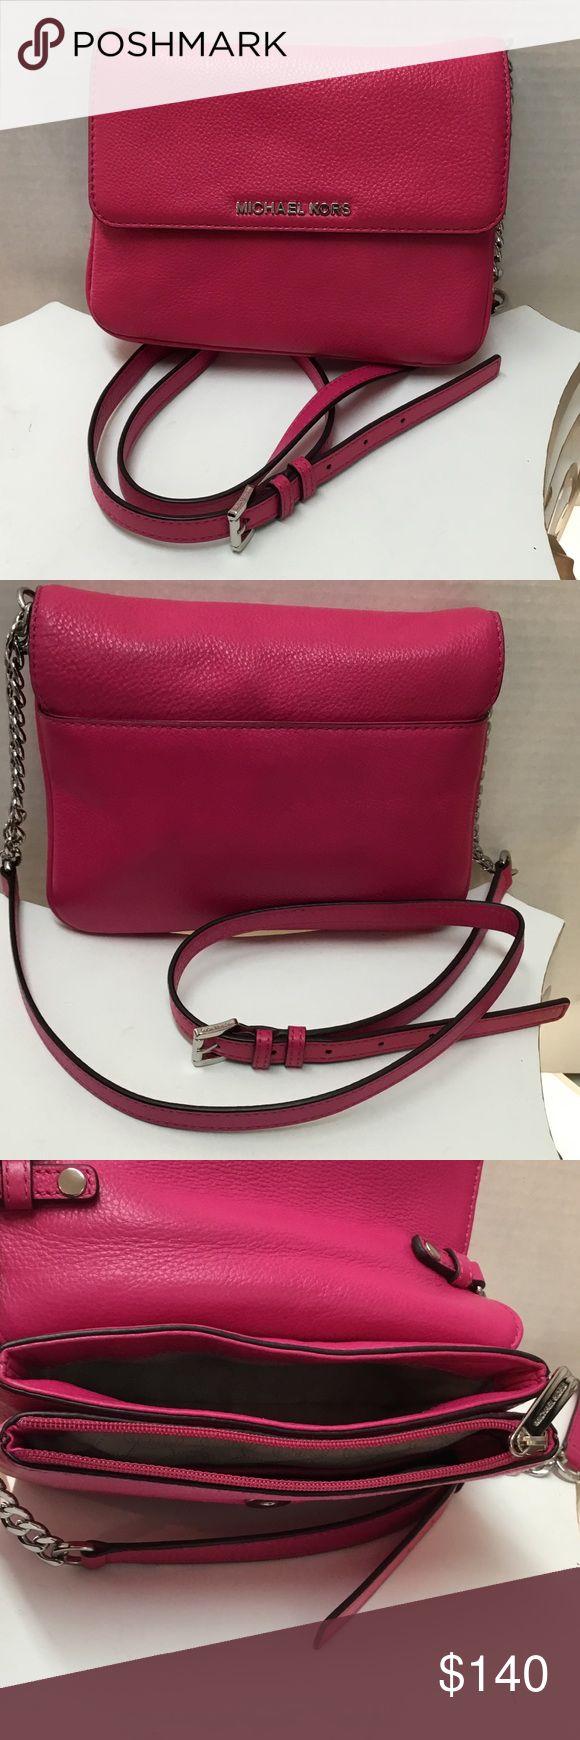 Authentic Michael Kors Crossbody Handbag Store Display in excellent condition cross-body handbag. Hot pink in color. Michael Kors Bags Crossbody Bags